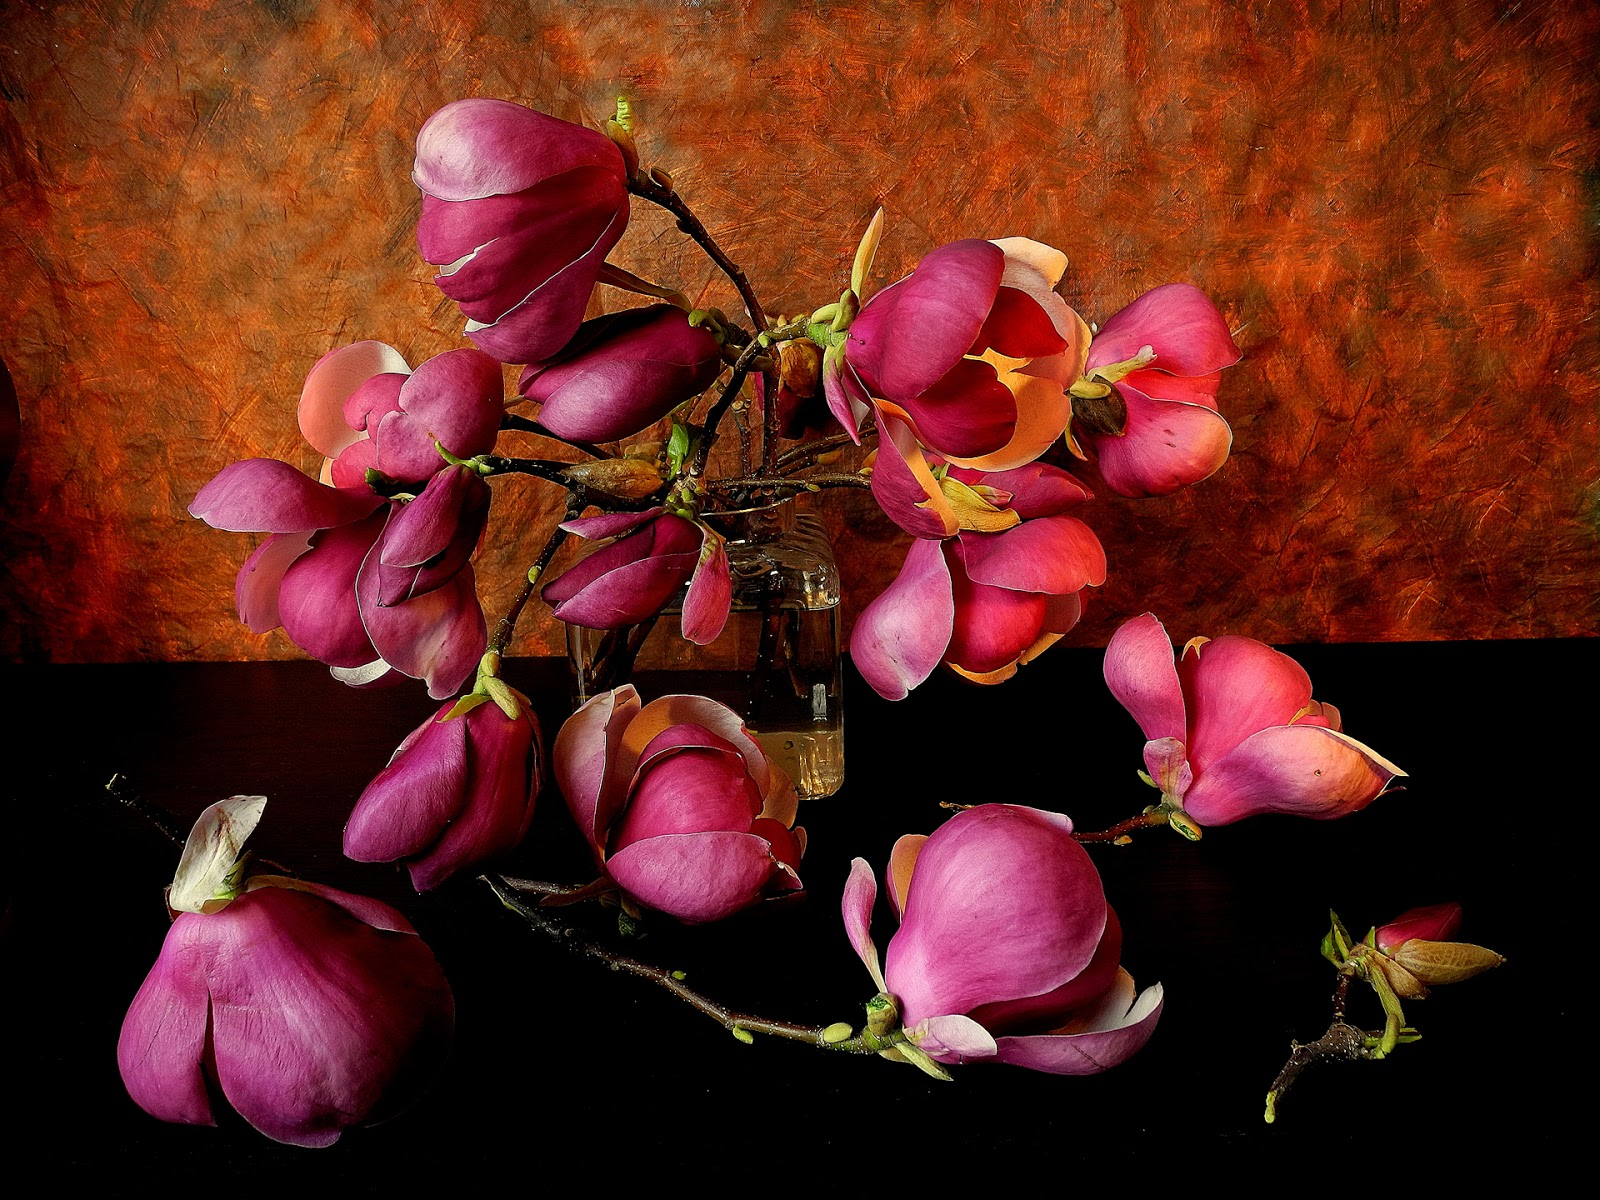 Arreglos De Flores Blancas en Pinterest